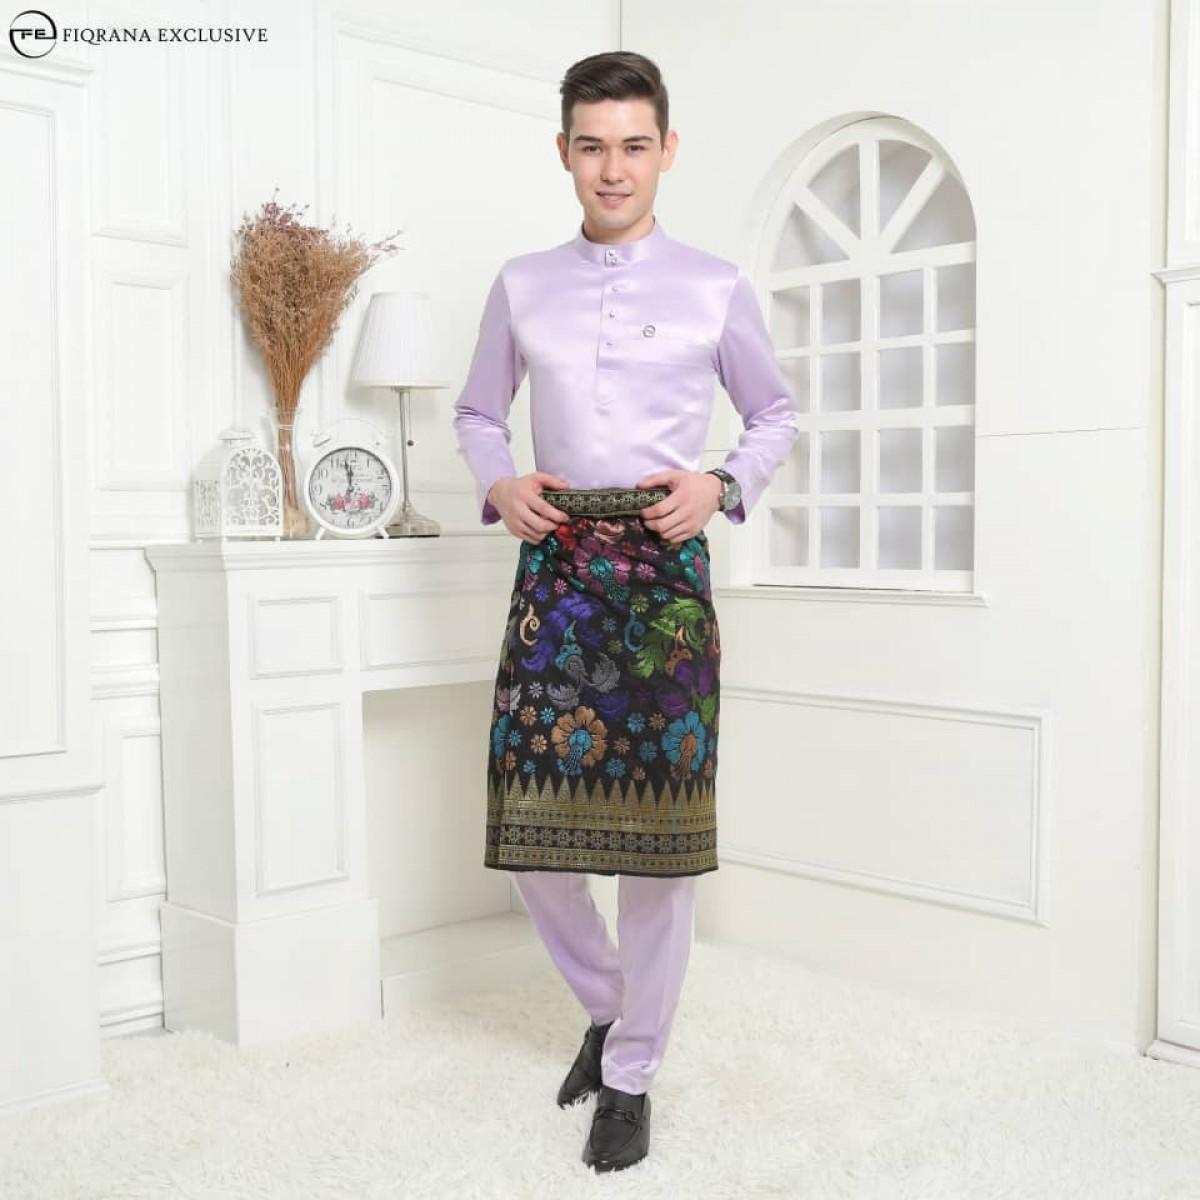 Baju Melayu Slimfit Lilac Purple - Fiqrana Exclusive